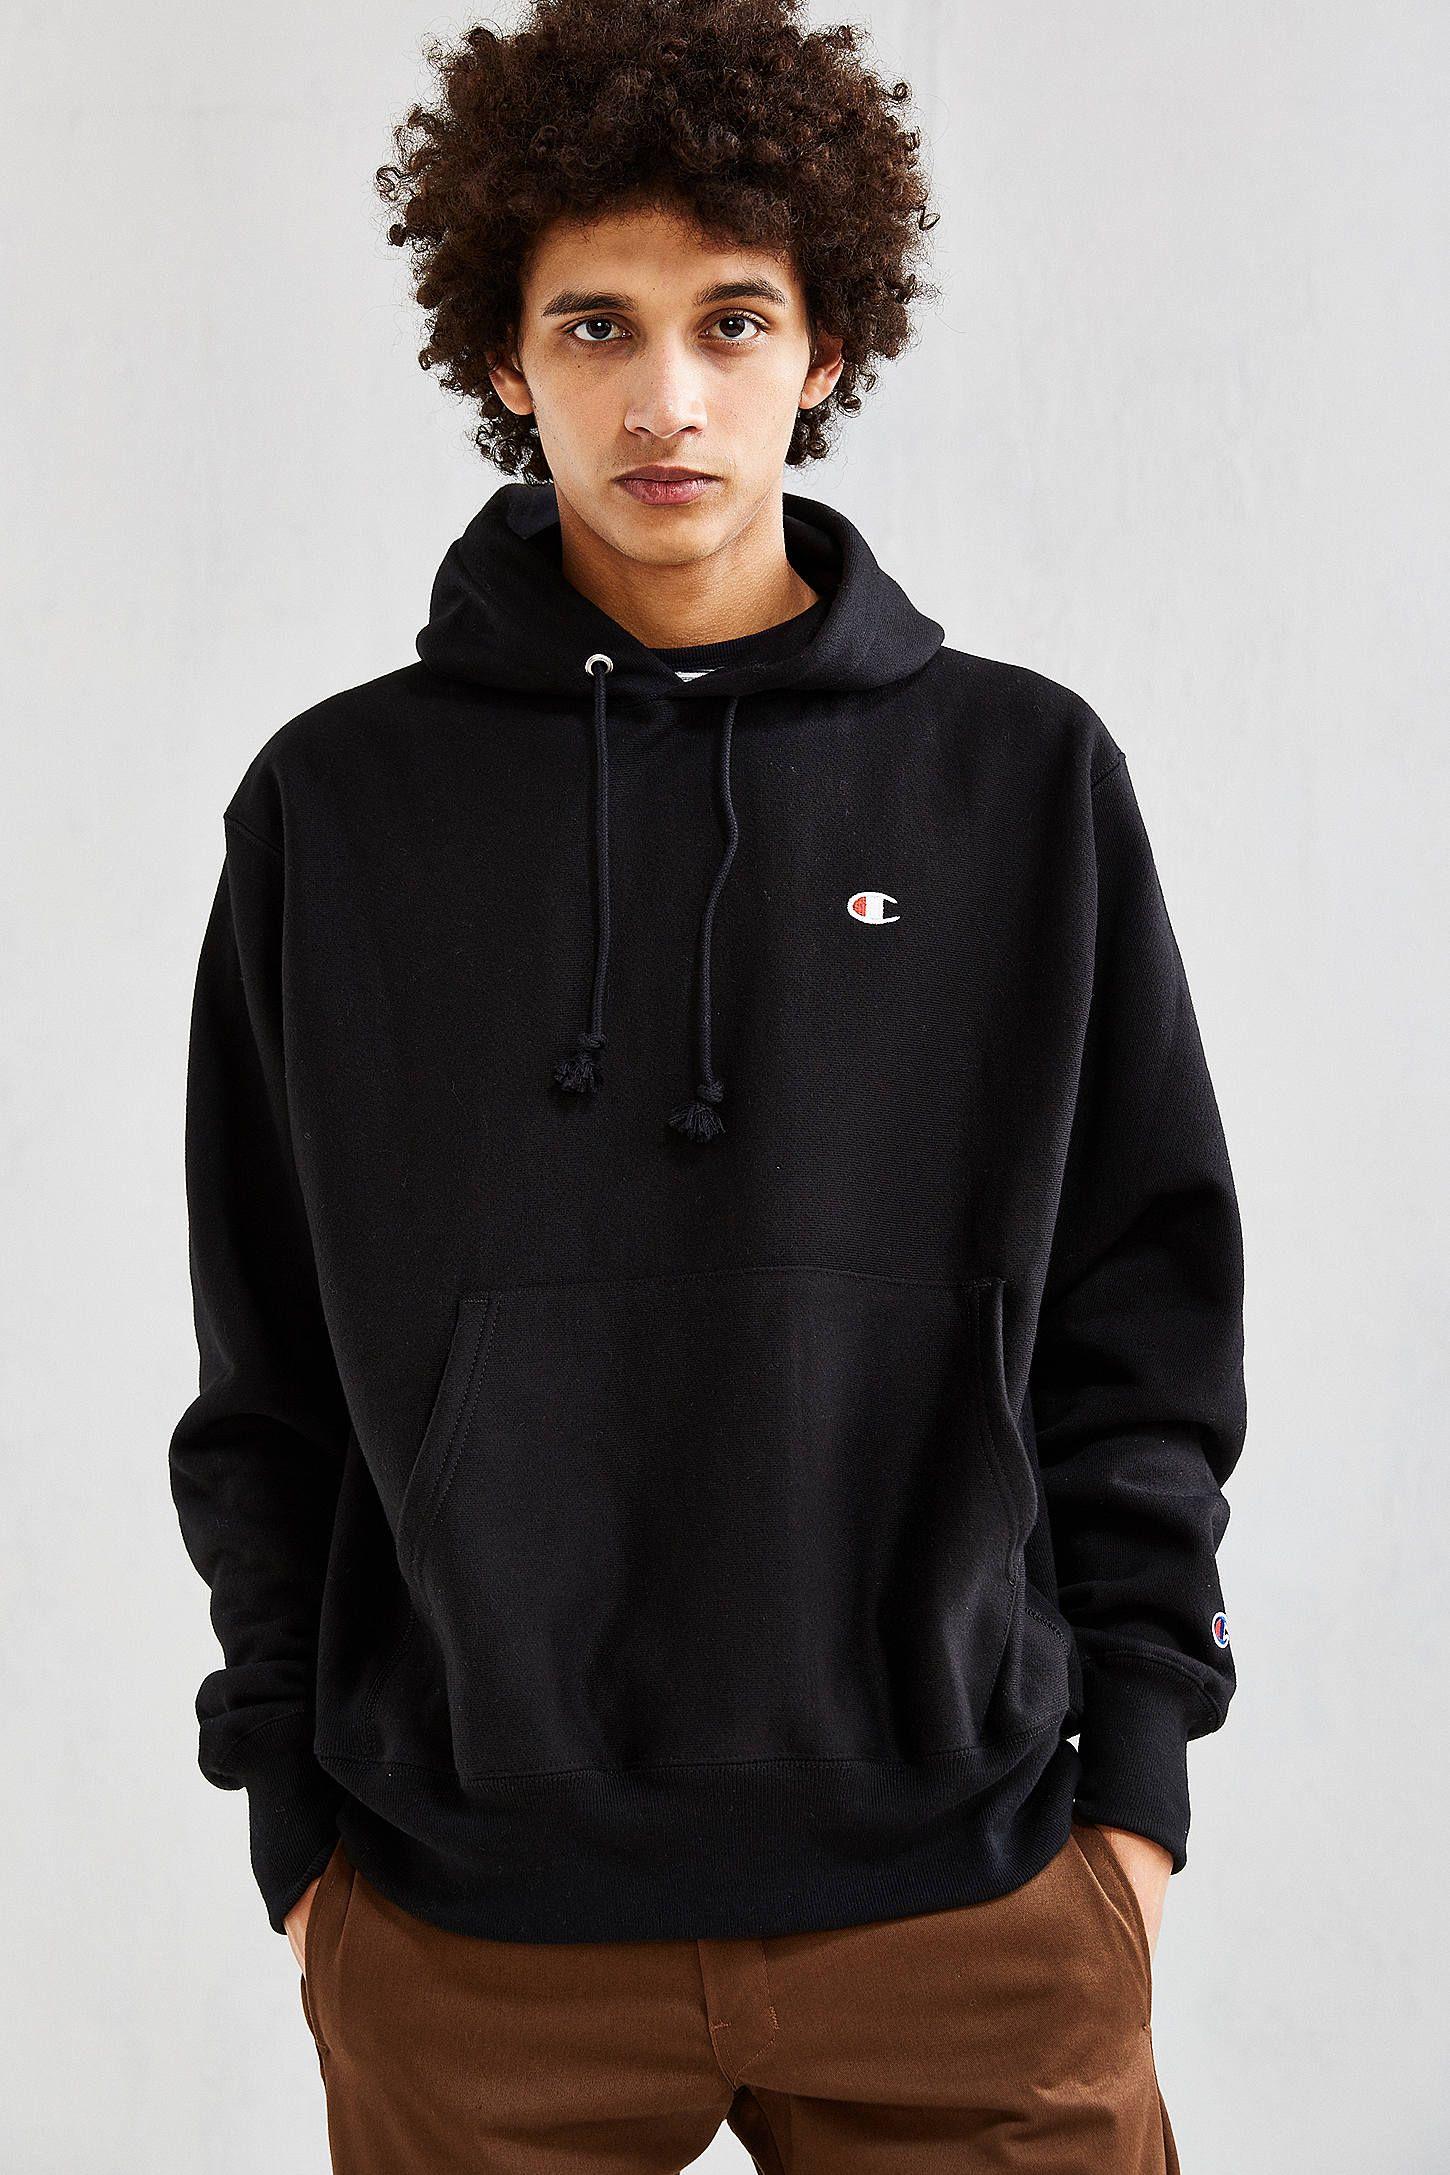 Hoodie Weave Champion Reverse List Wish Pinterest Sweatshirt EFxTwq